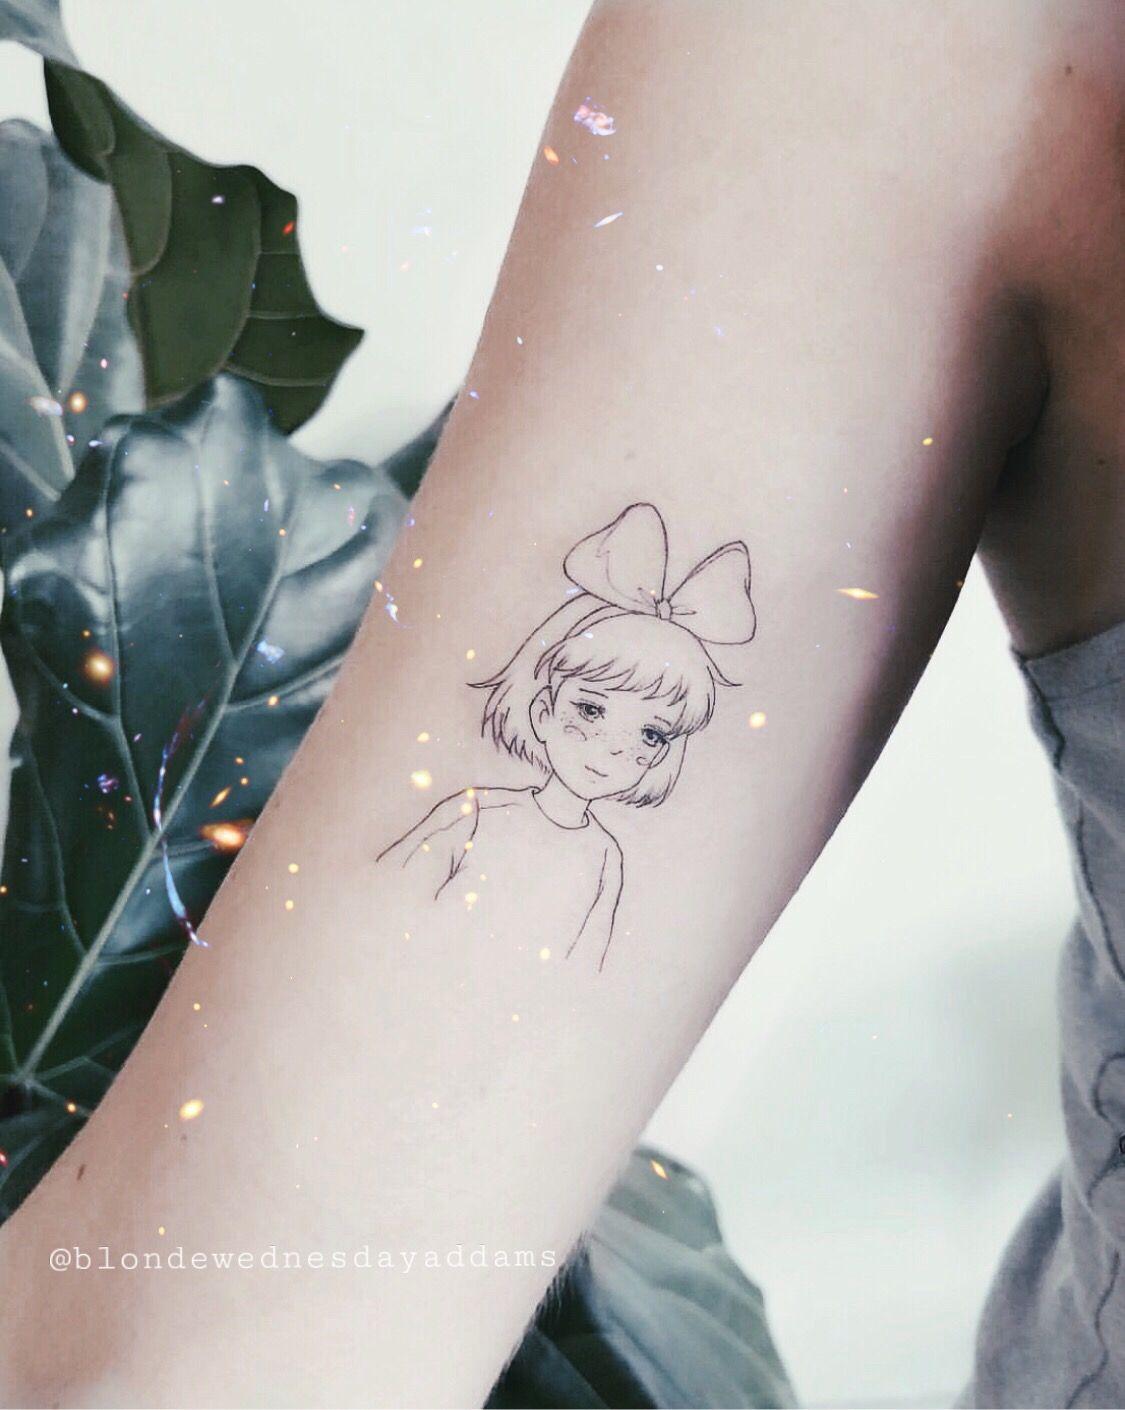 Studio Ghibli Tattoo Kiki S Delivery Service Small Ghibli Tattoo Kiki Tattoo Ghibli Tattoo Geometric Tattoo Tattoos For Guys